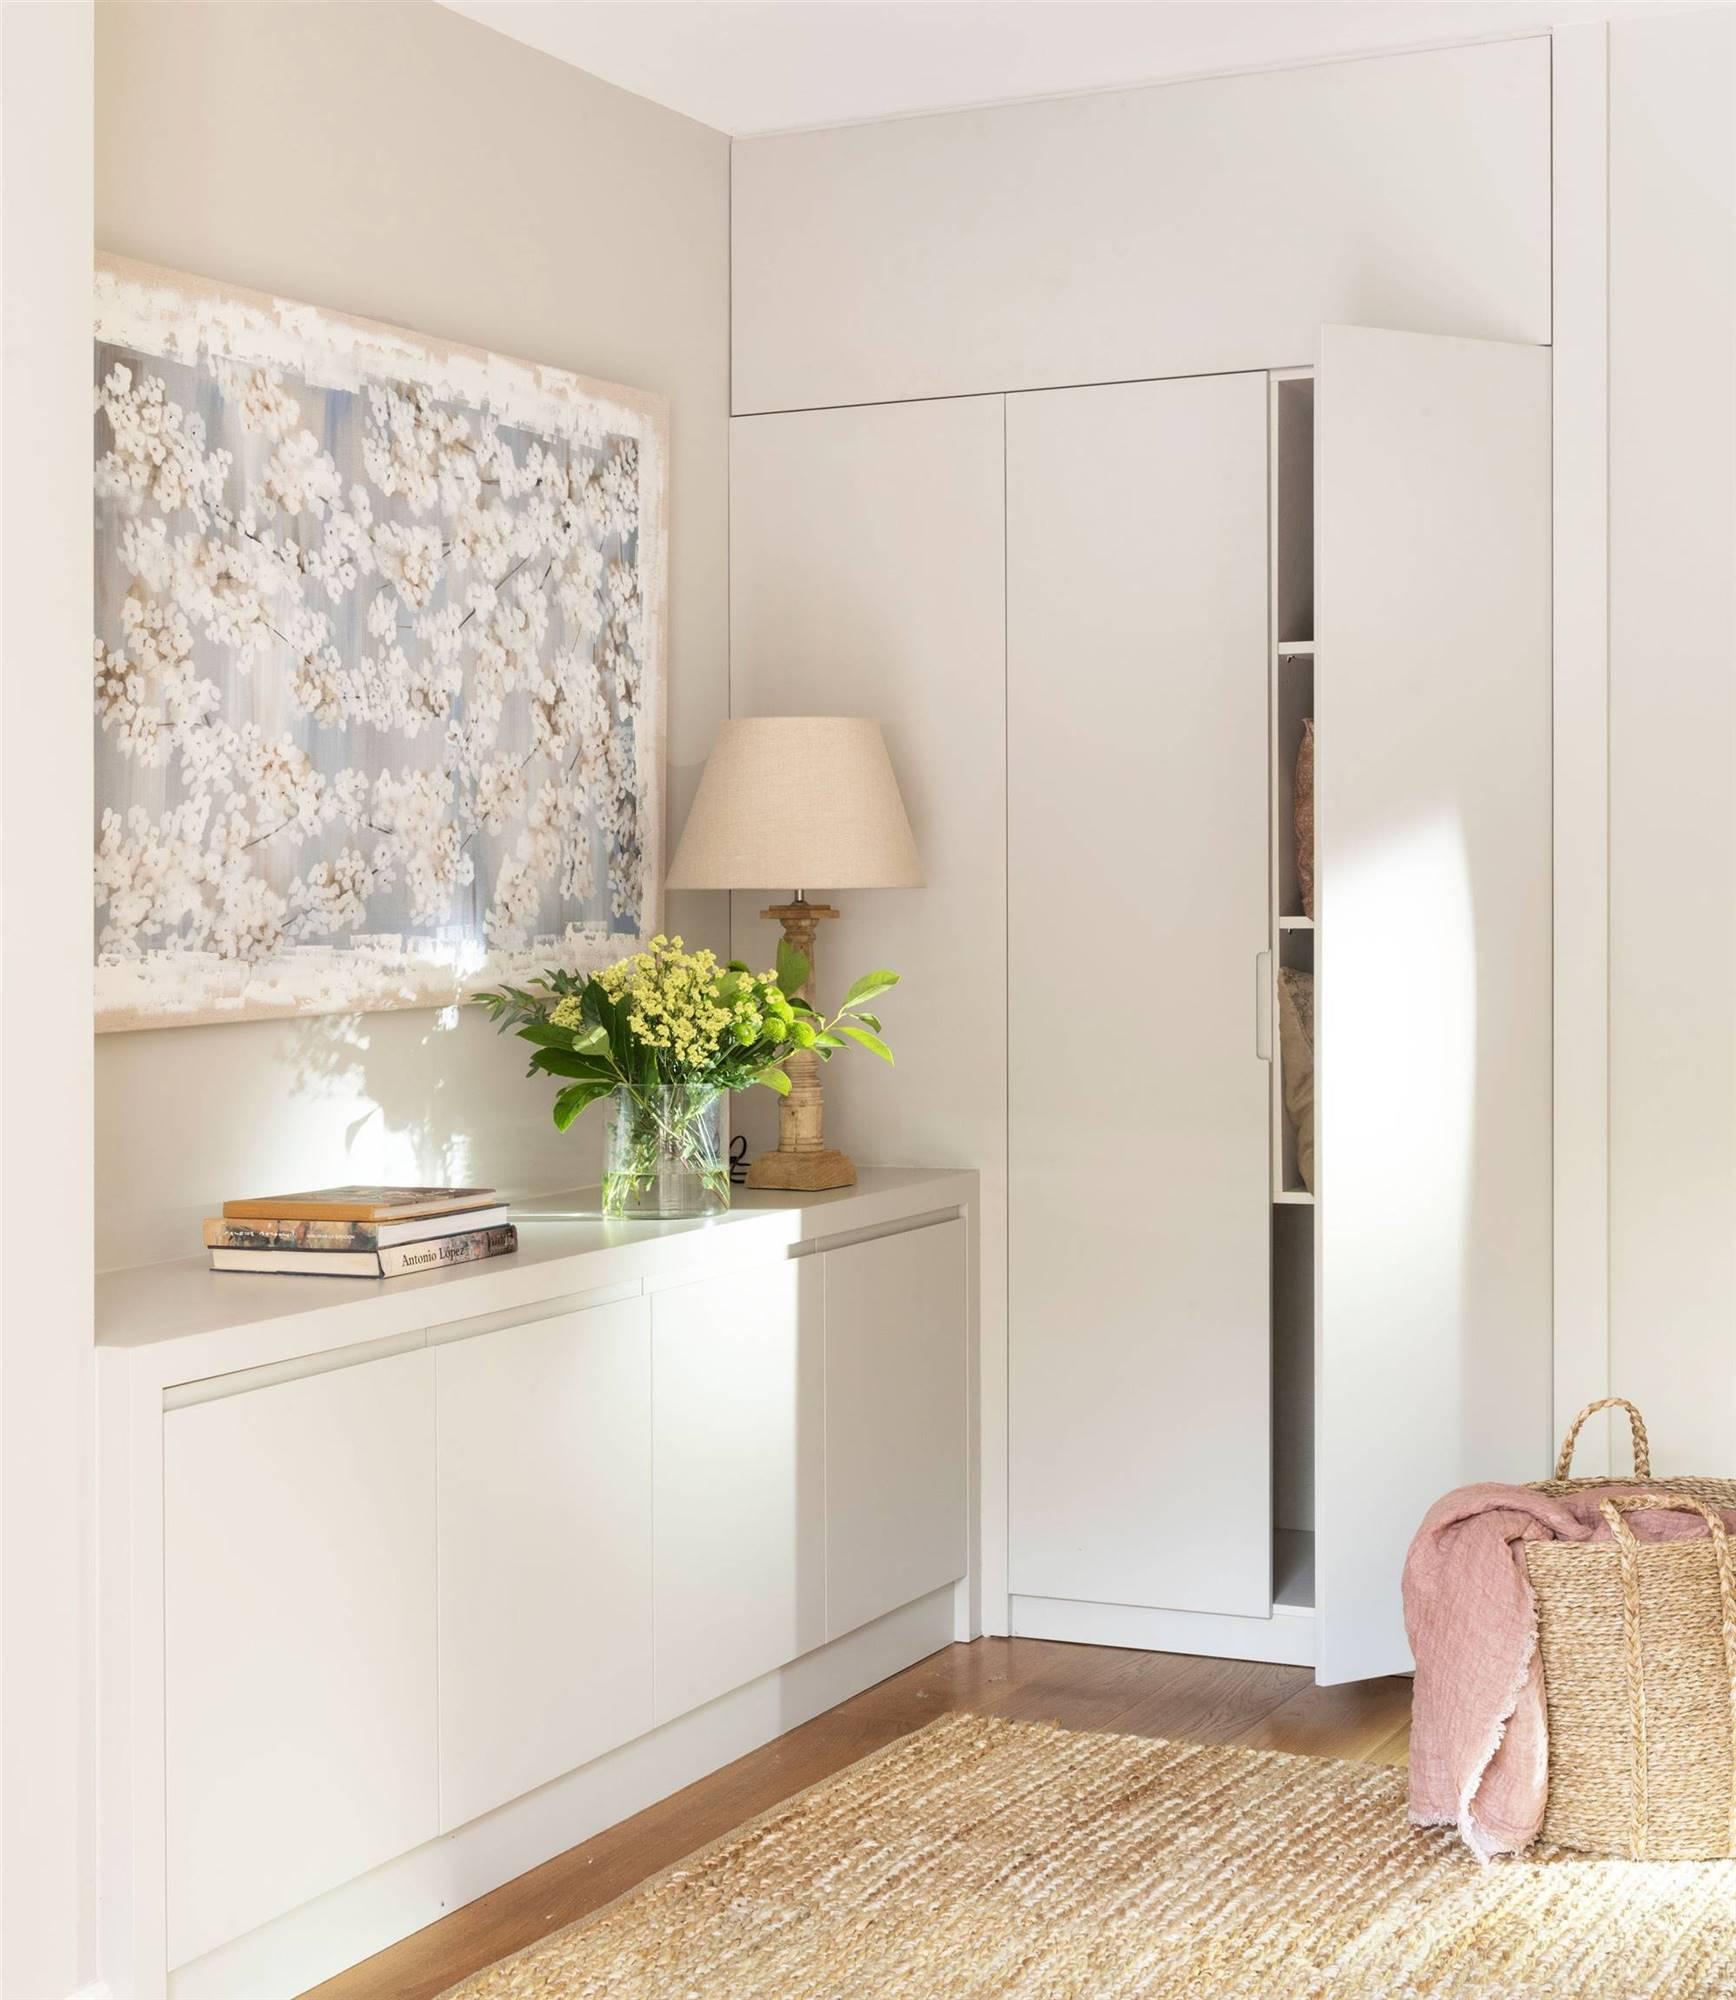 Recibidores modernos muy bien decorados - Muebles de recibidor modernos ...